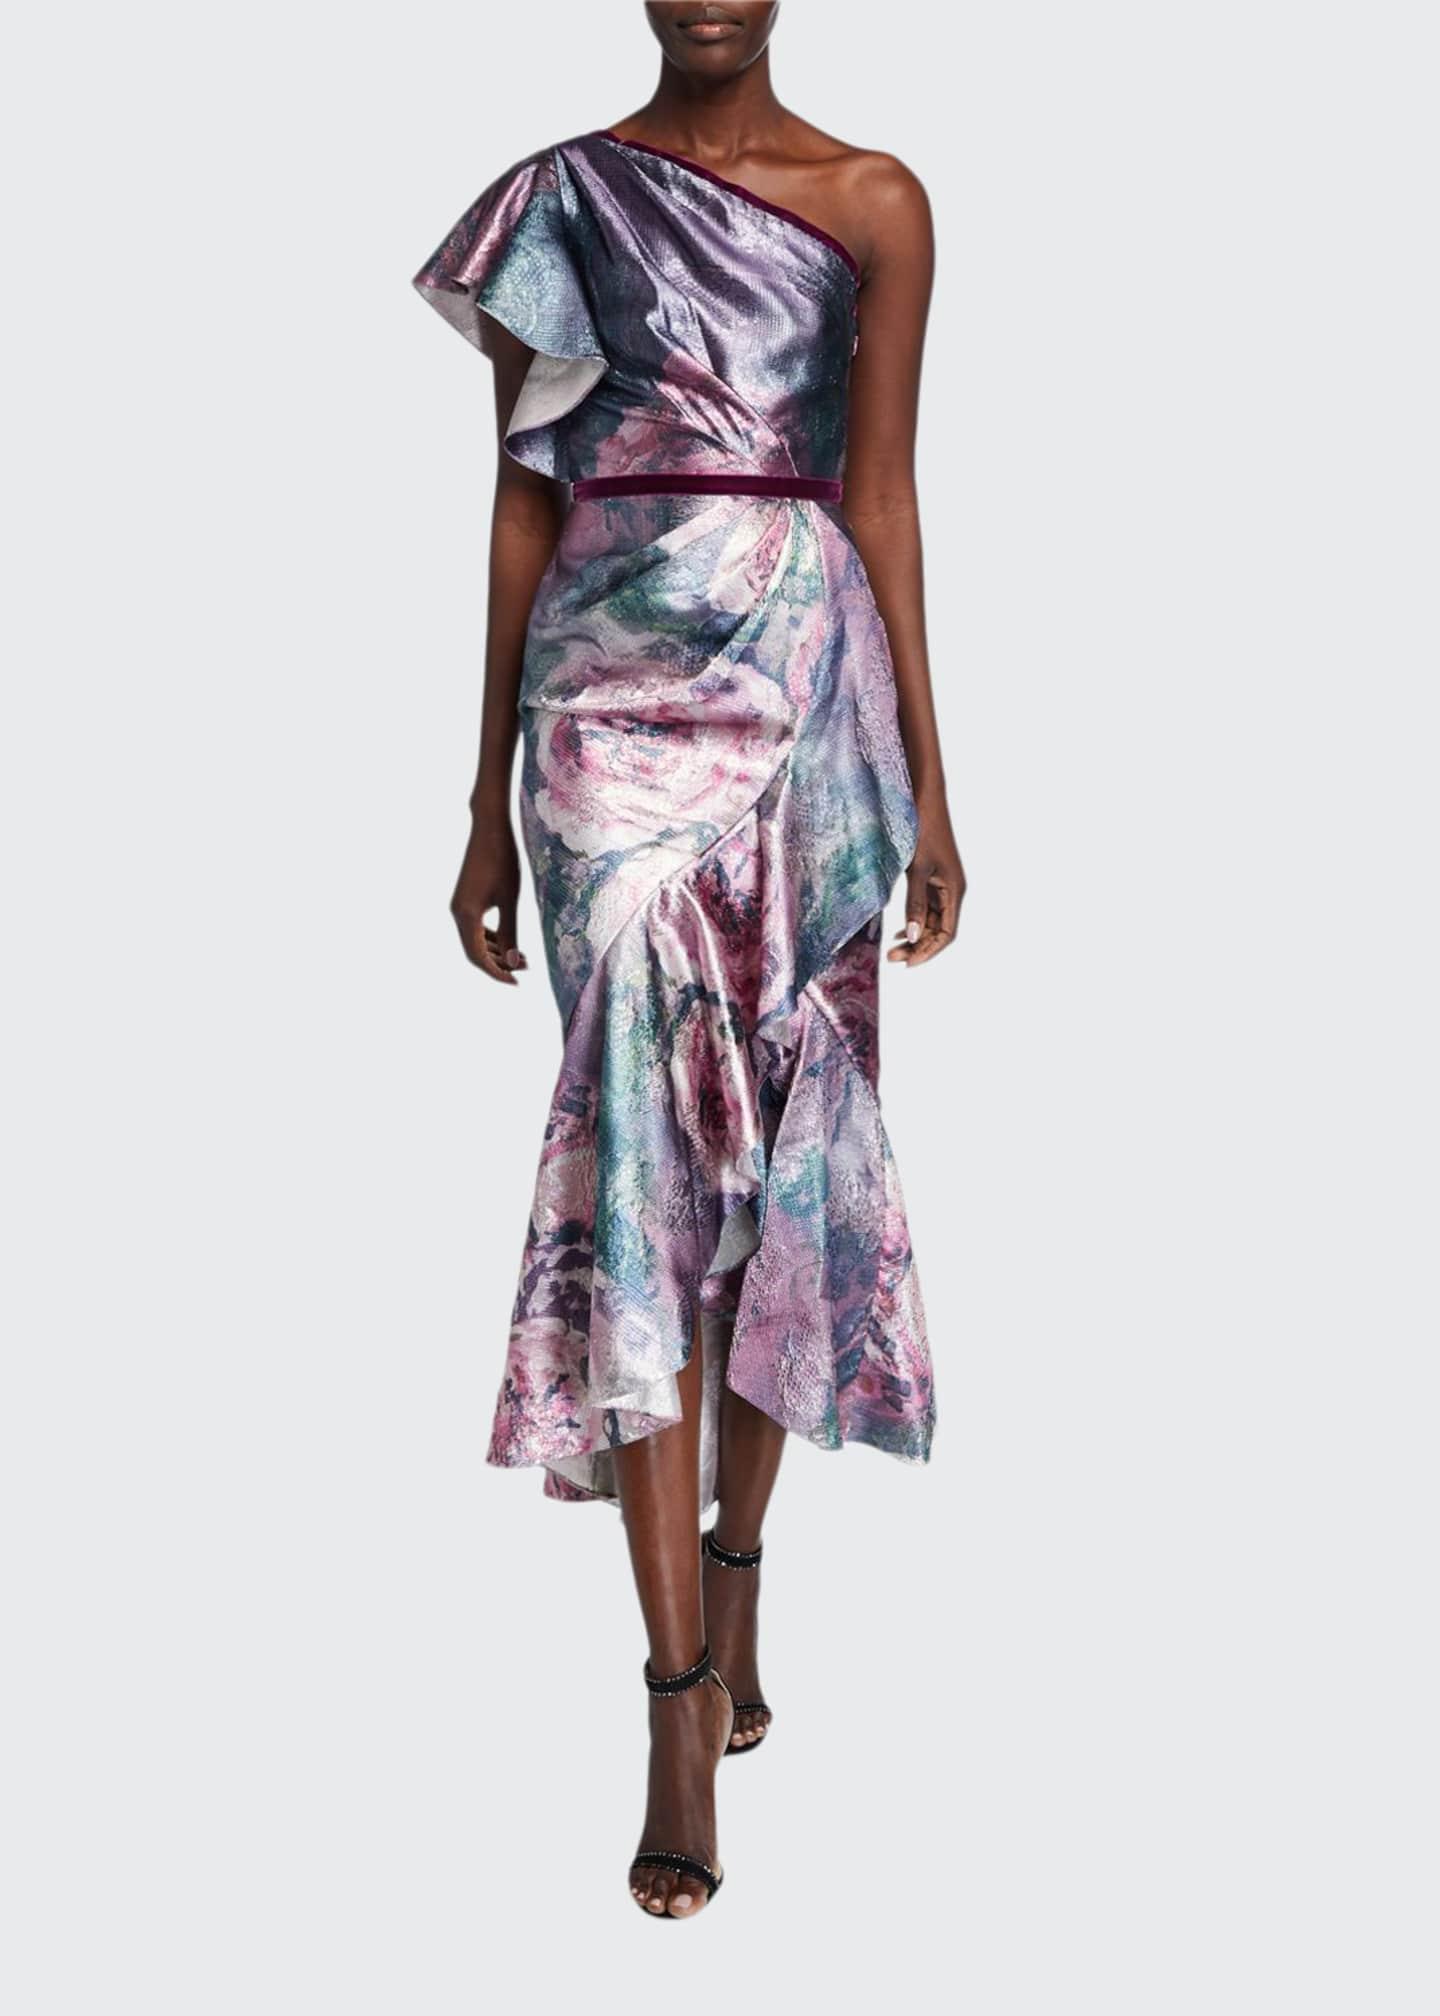 Marchesa Notte Metallic Jacquard One-Shoulder Tea Length Dress